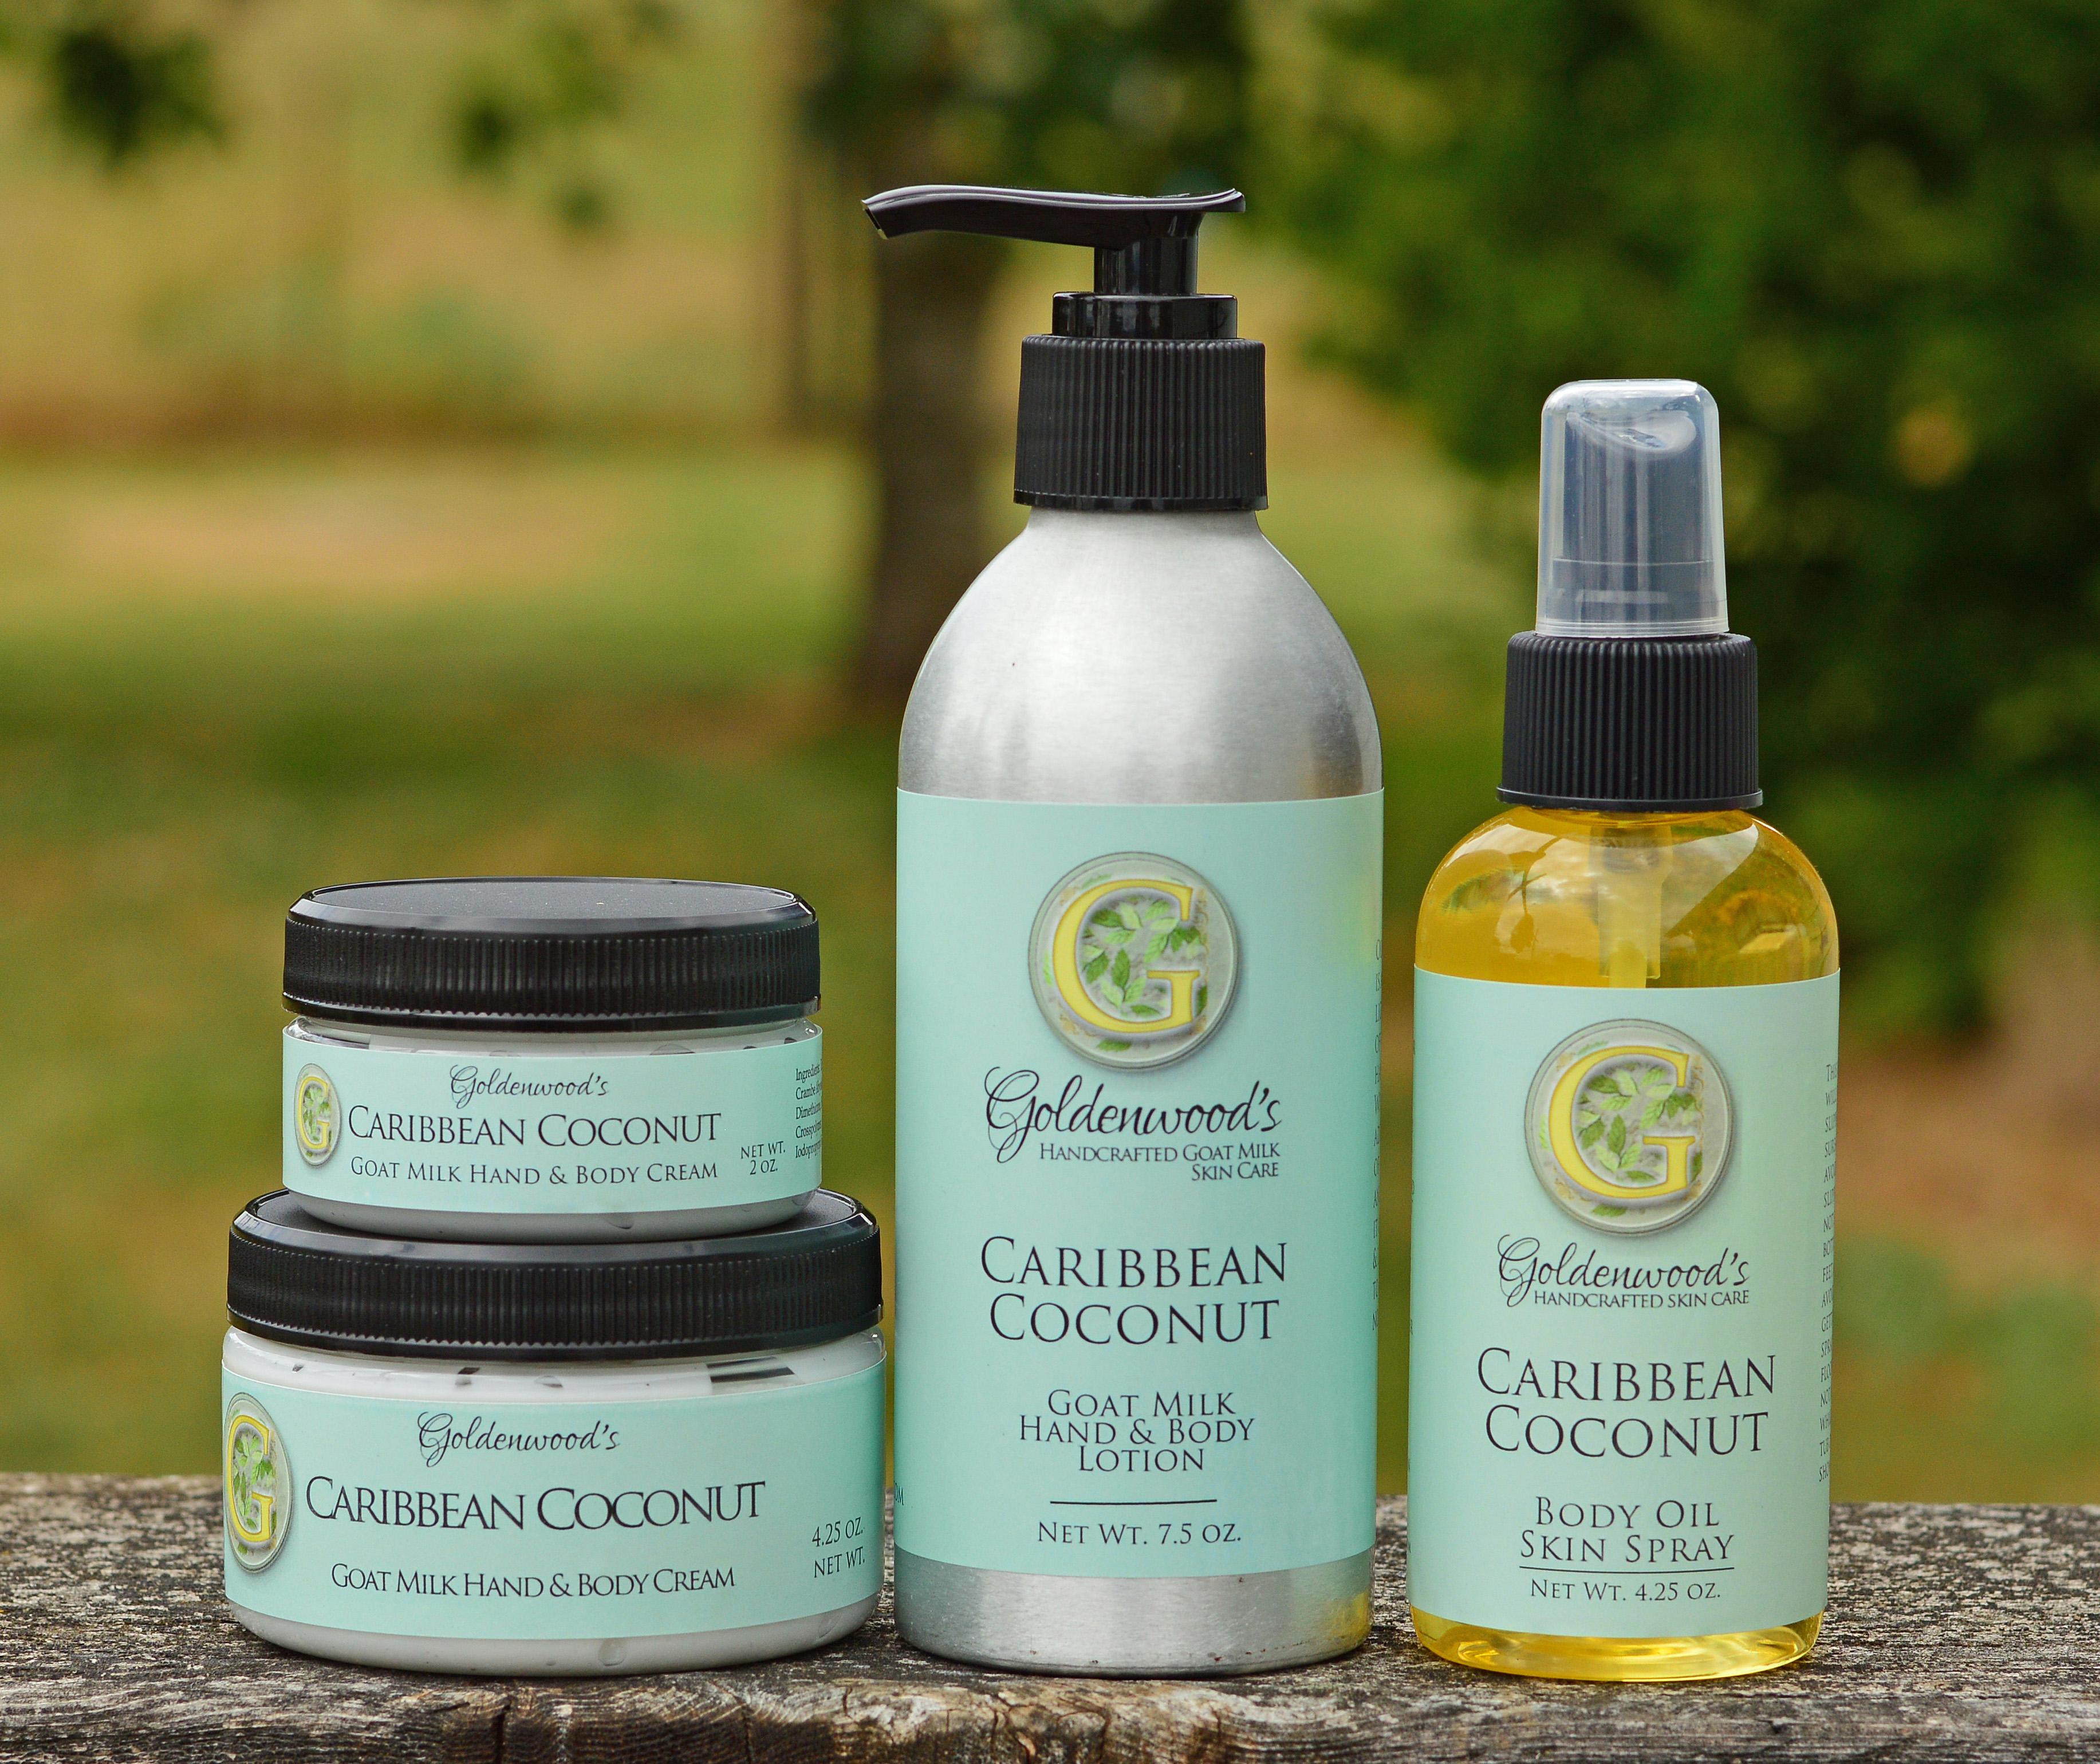 caribbean-coconut-collection.jpg